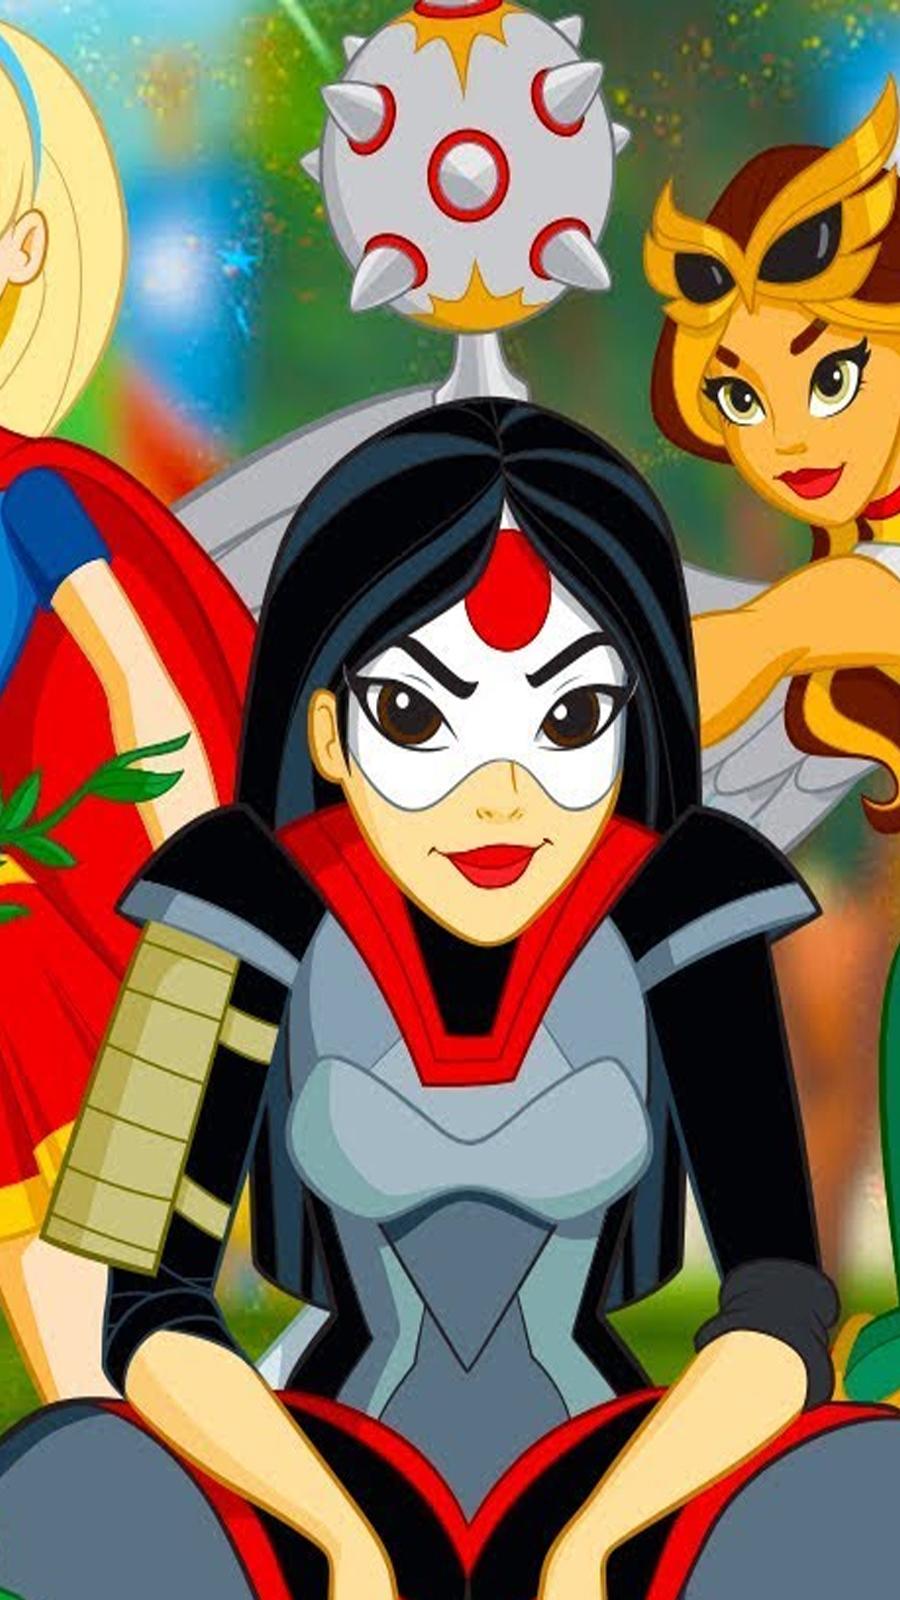 DC Super Hero Girls Wallpapers Free Download